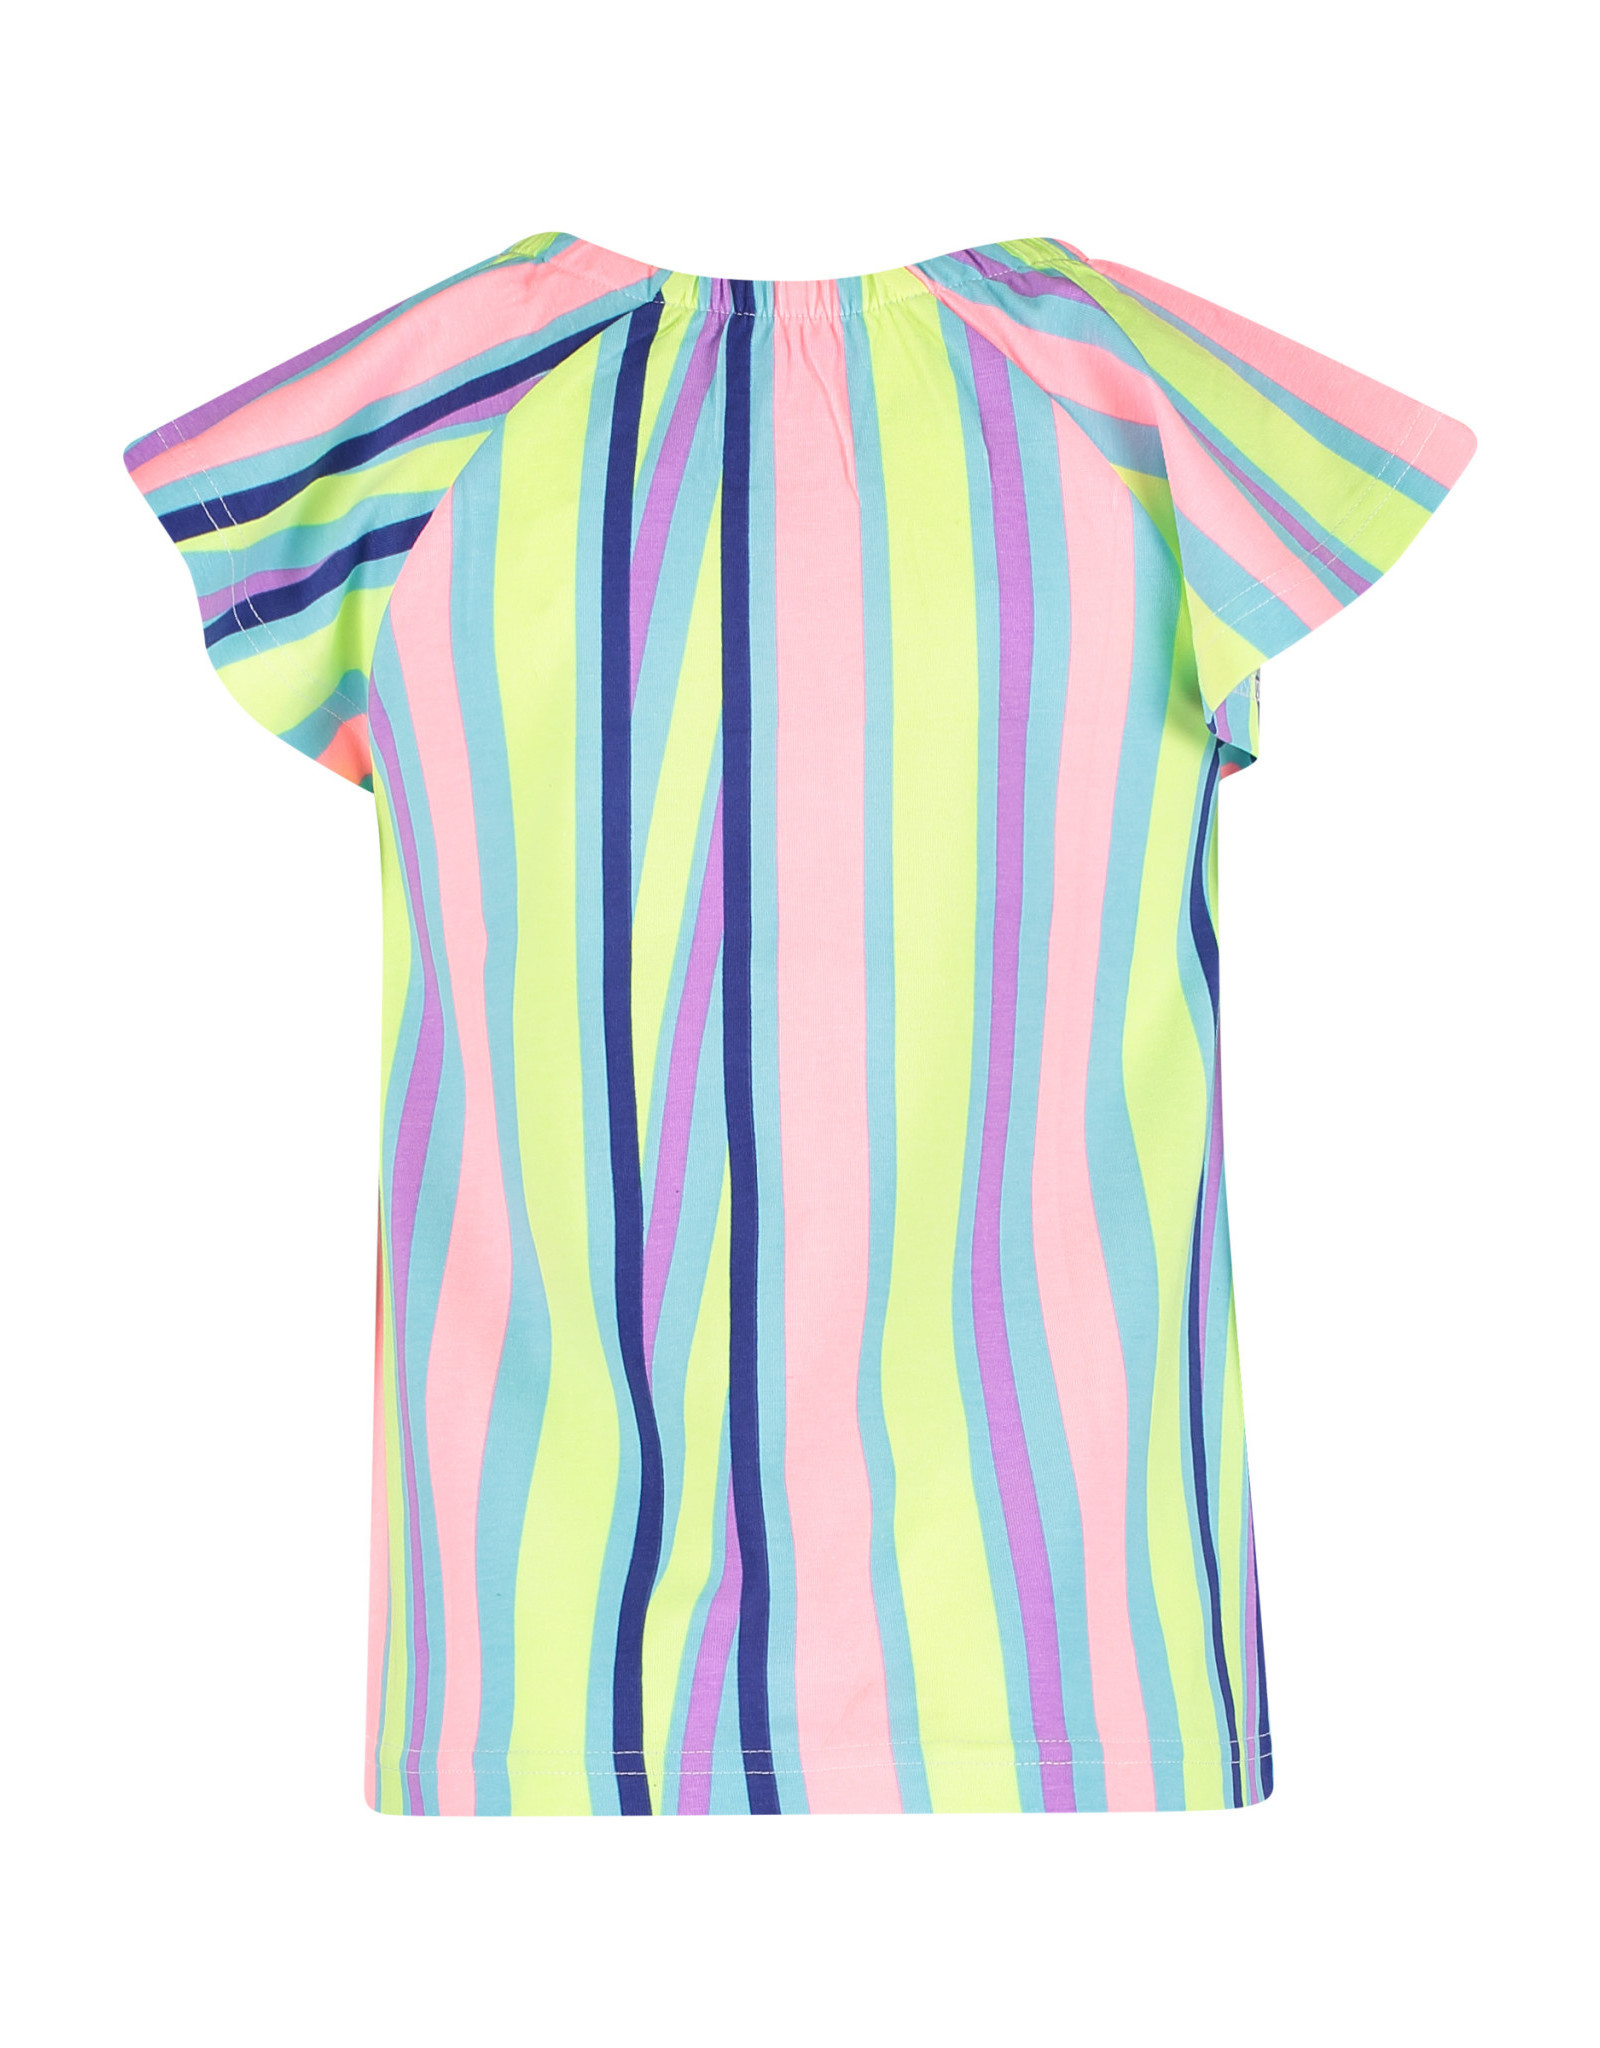 4President 4President meisjes t-shirt Maya Multicolor Stripes